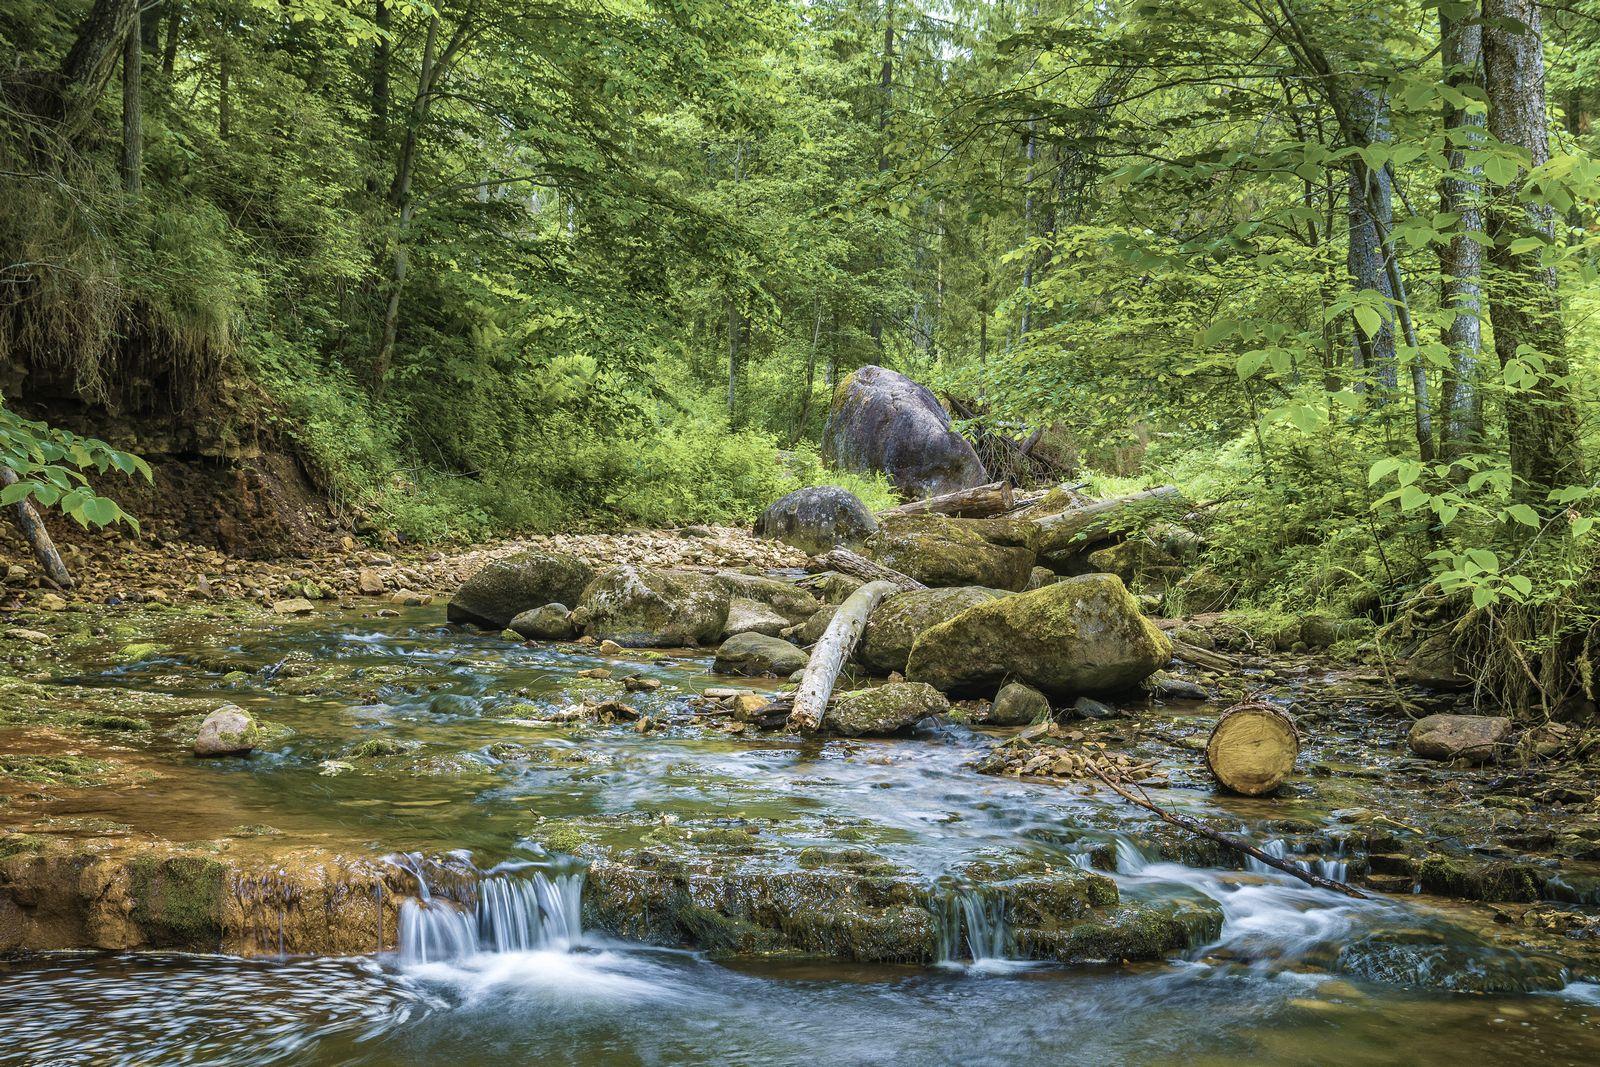 Долина реки Прикша. Прикша Новгородская область Боровичи